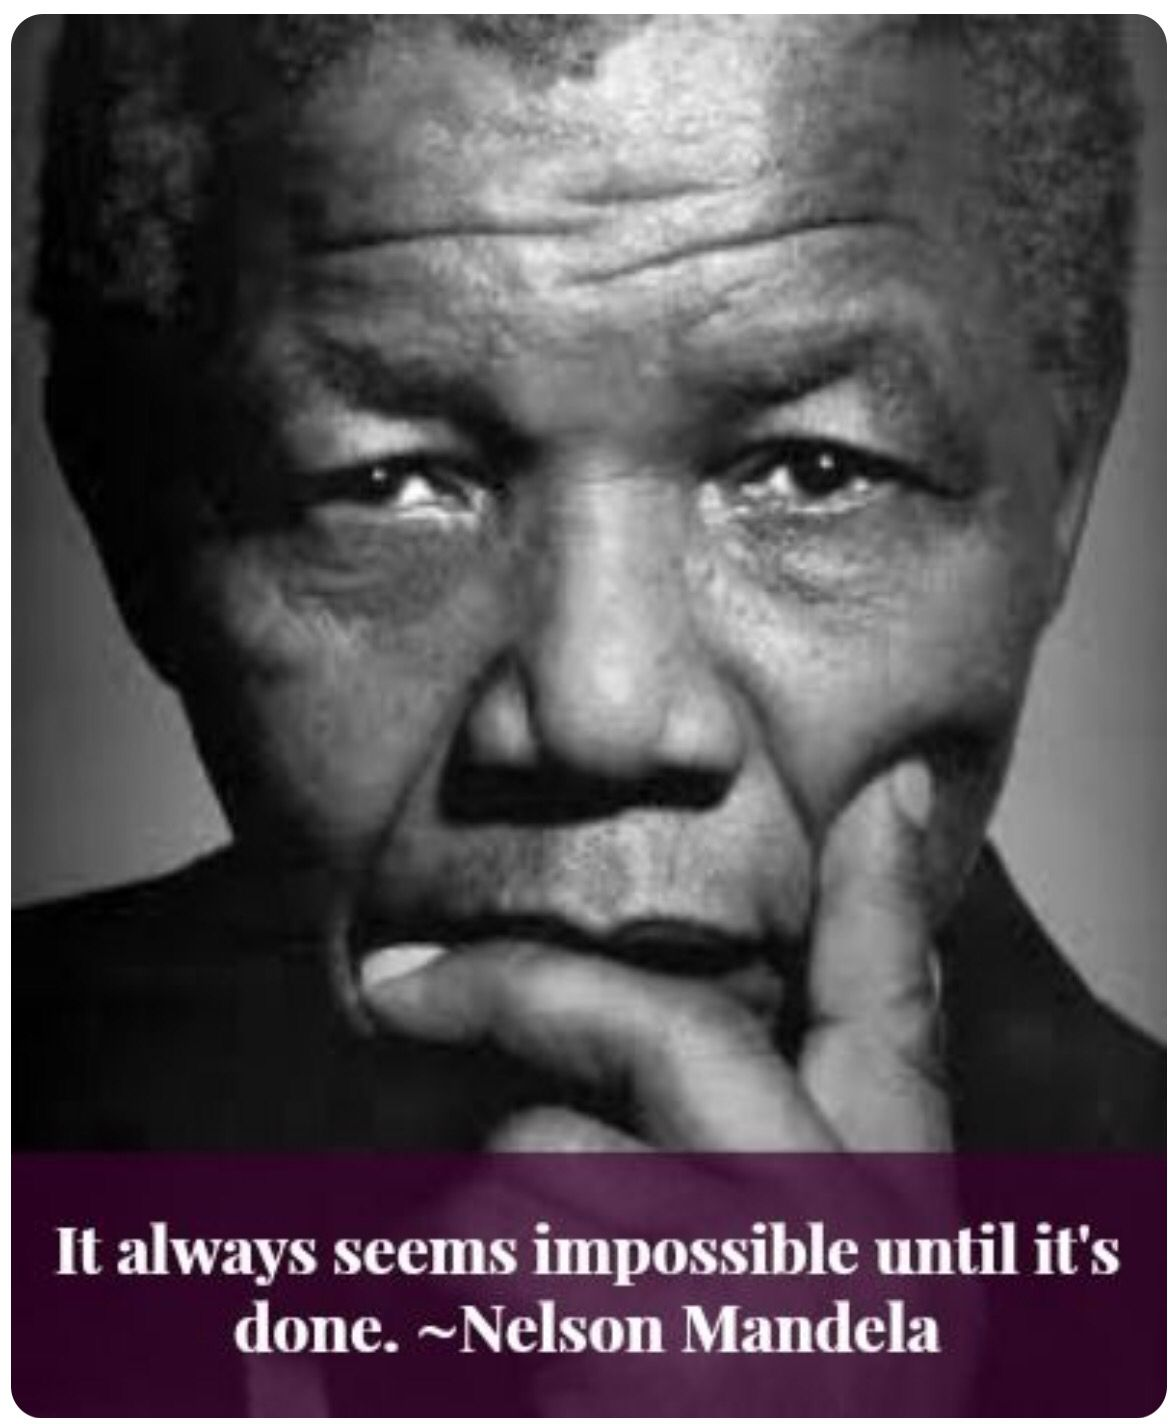 Mandela Quotes About Love Pindebbie Allen On Inspirational Messages & Quotes  Pinterest